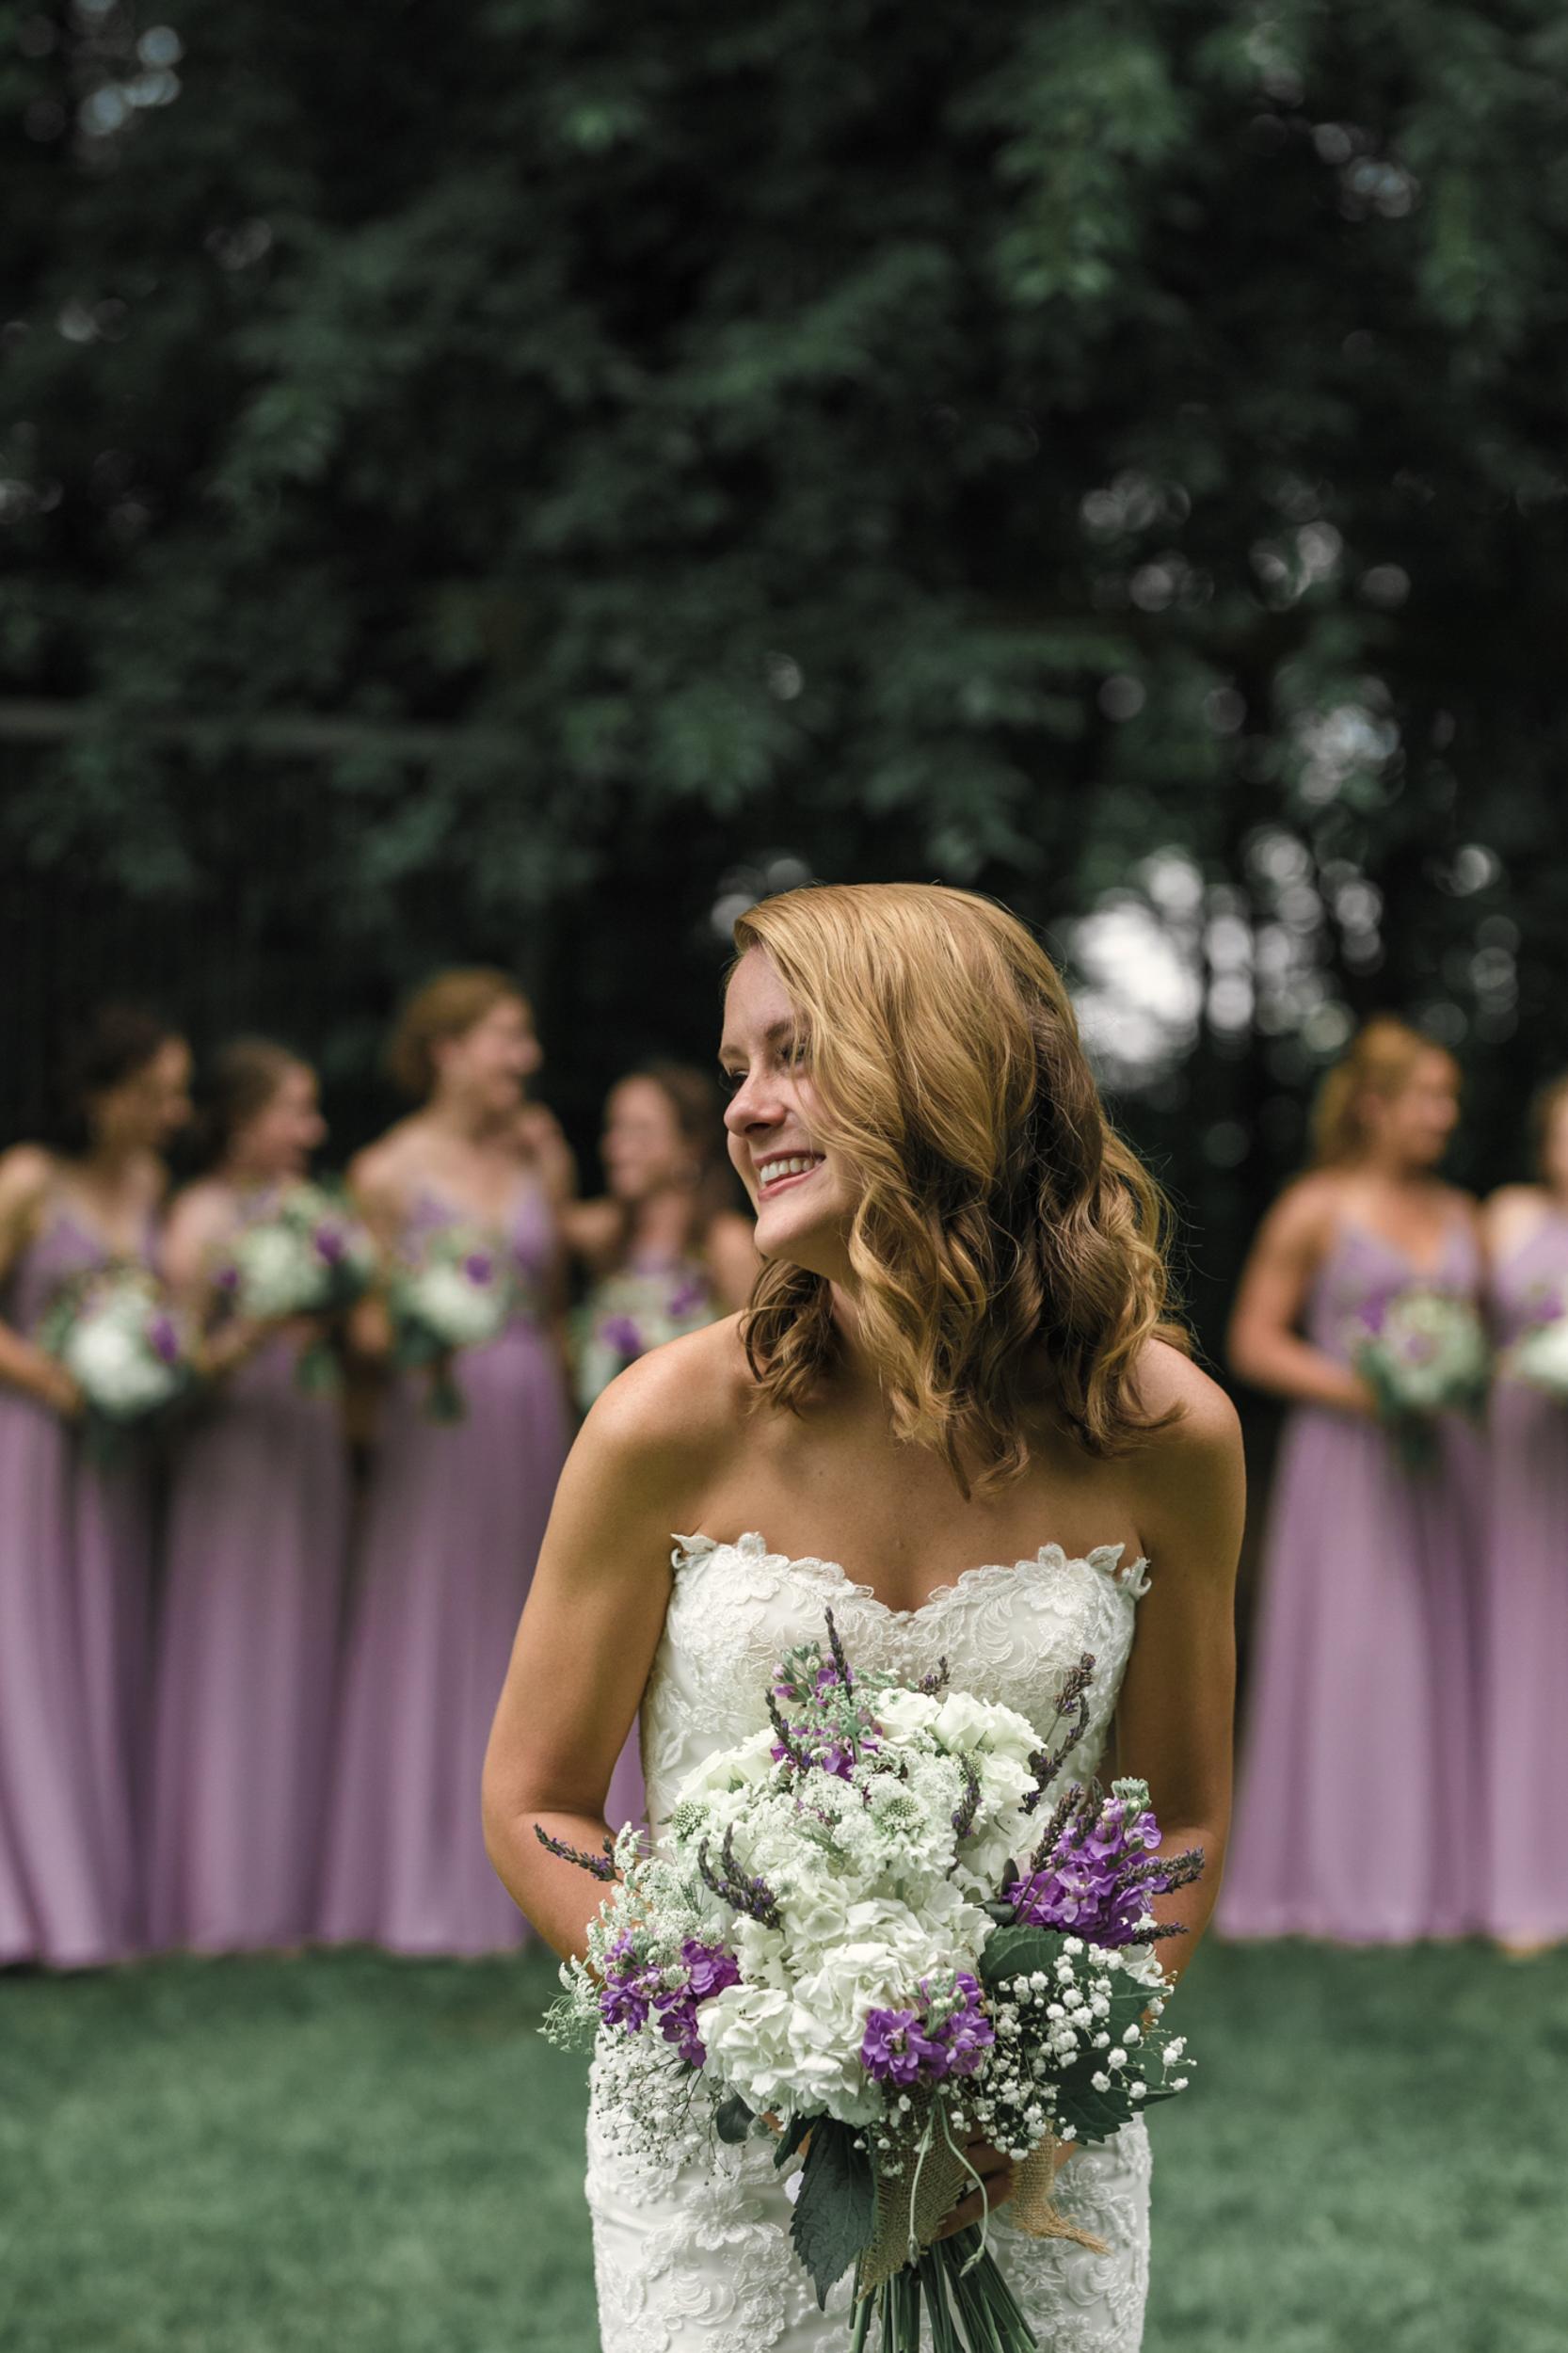 wedding-photography-dark-moody-rustic-details-21.jpg